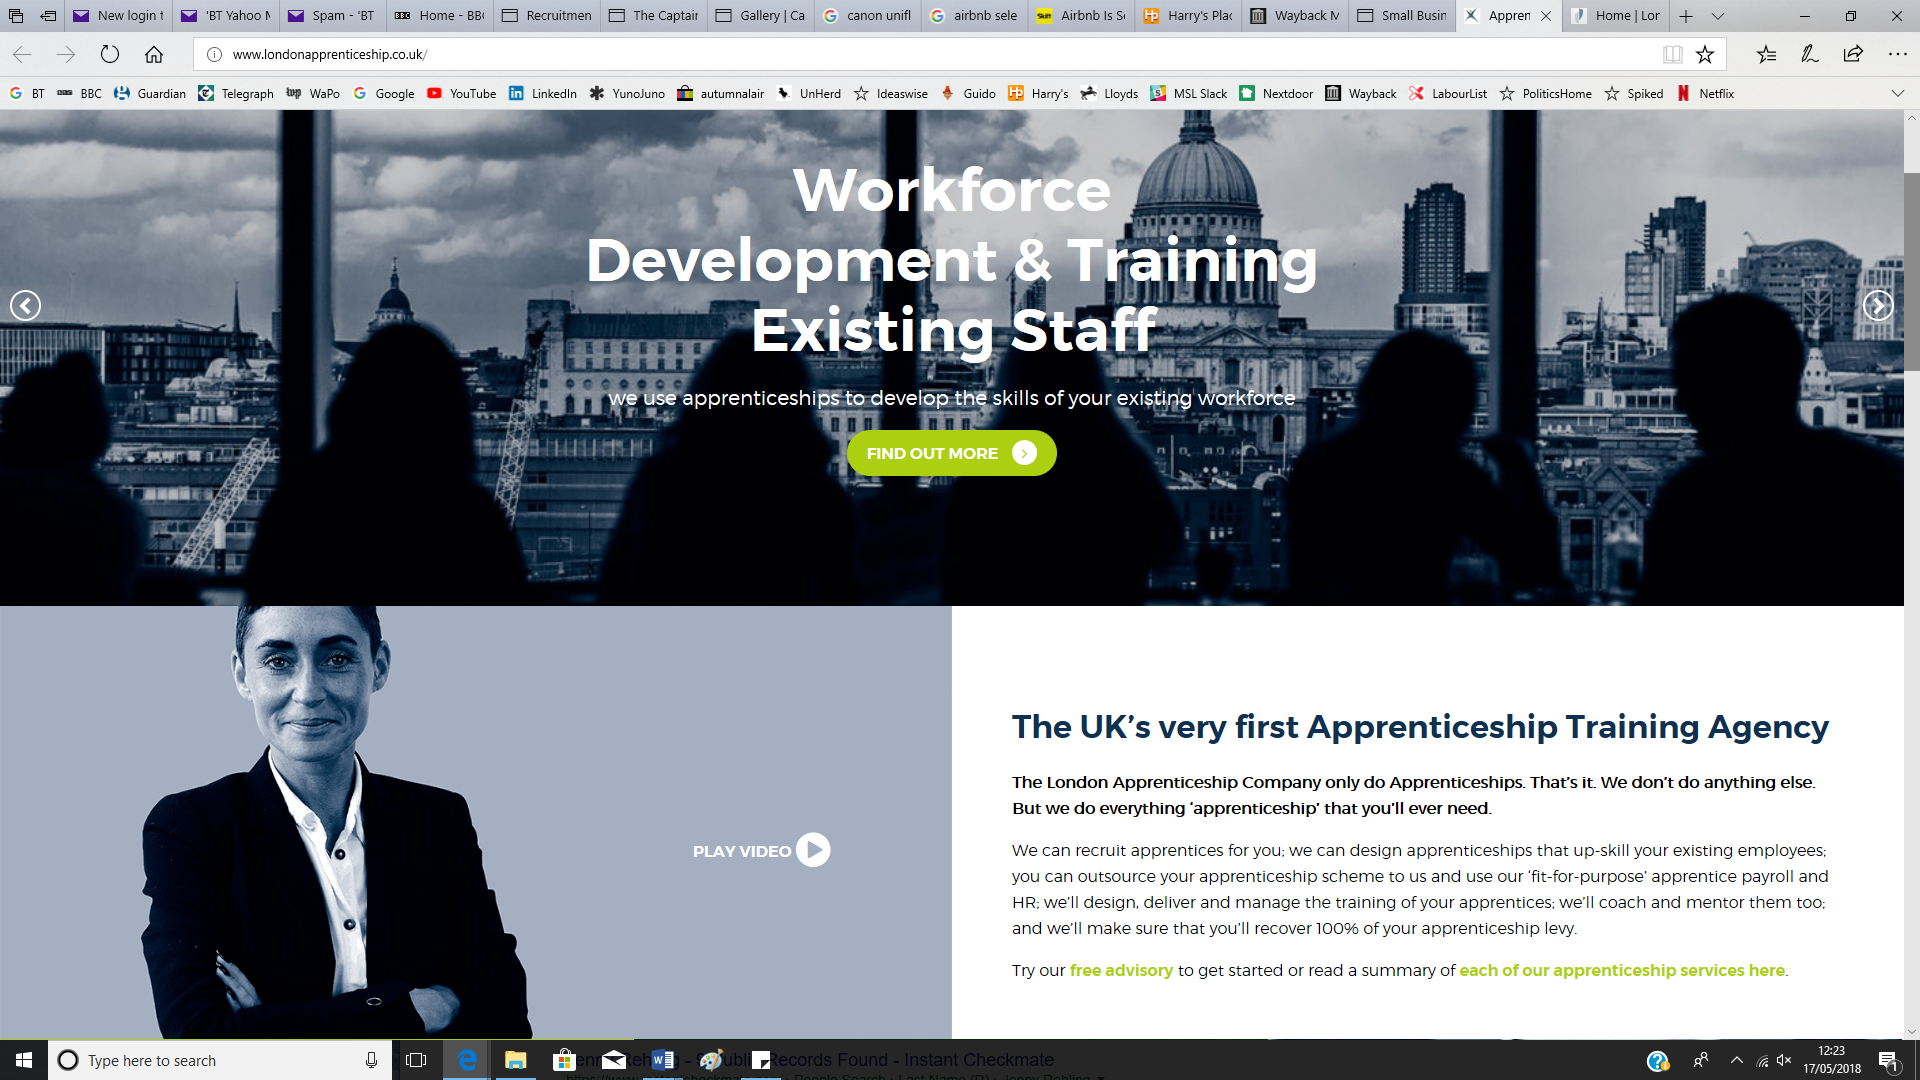 London Apprenticeship Company - web copy